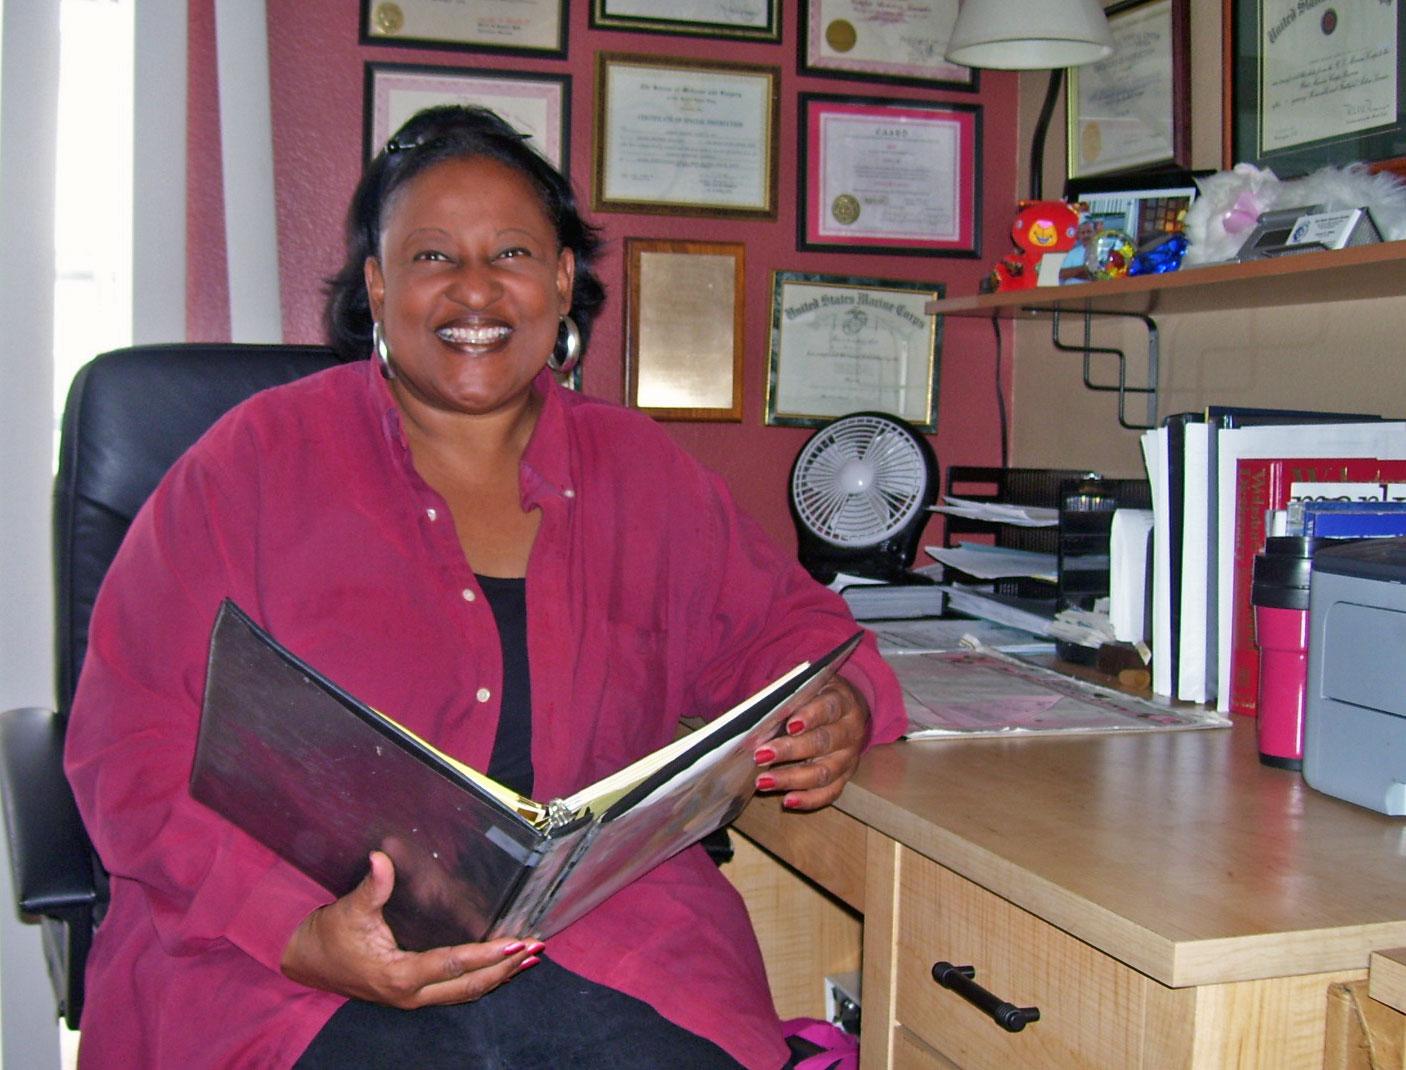 Pam Ennis, Smoking Cessation Instructor